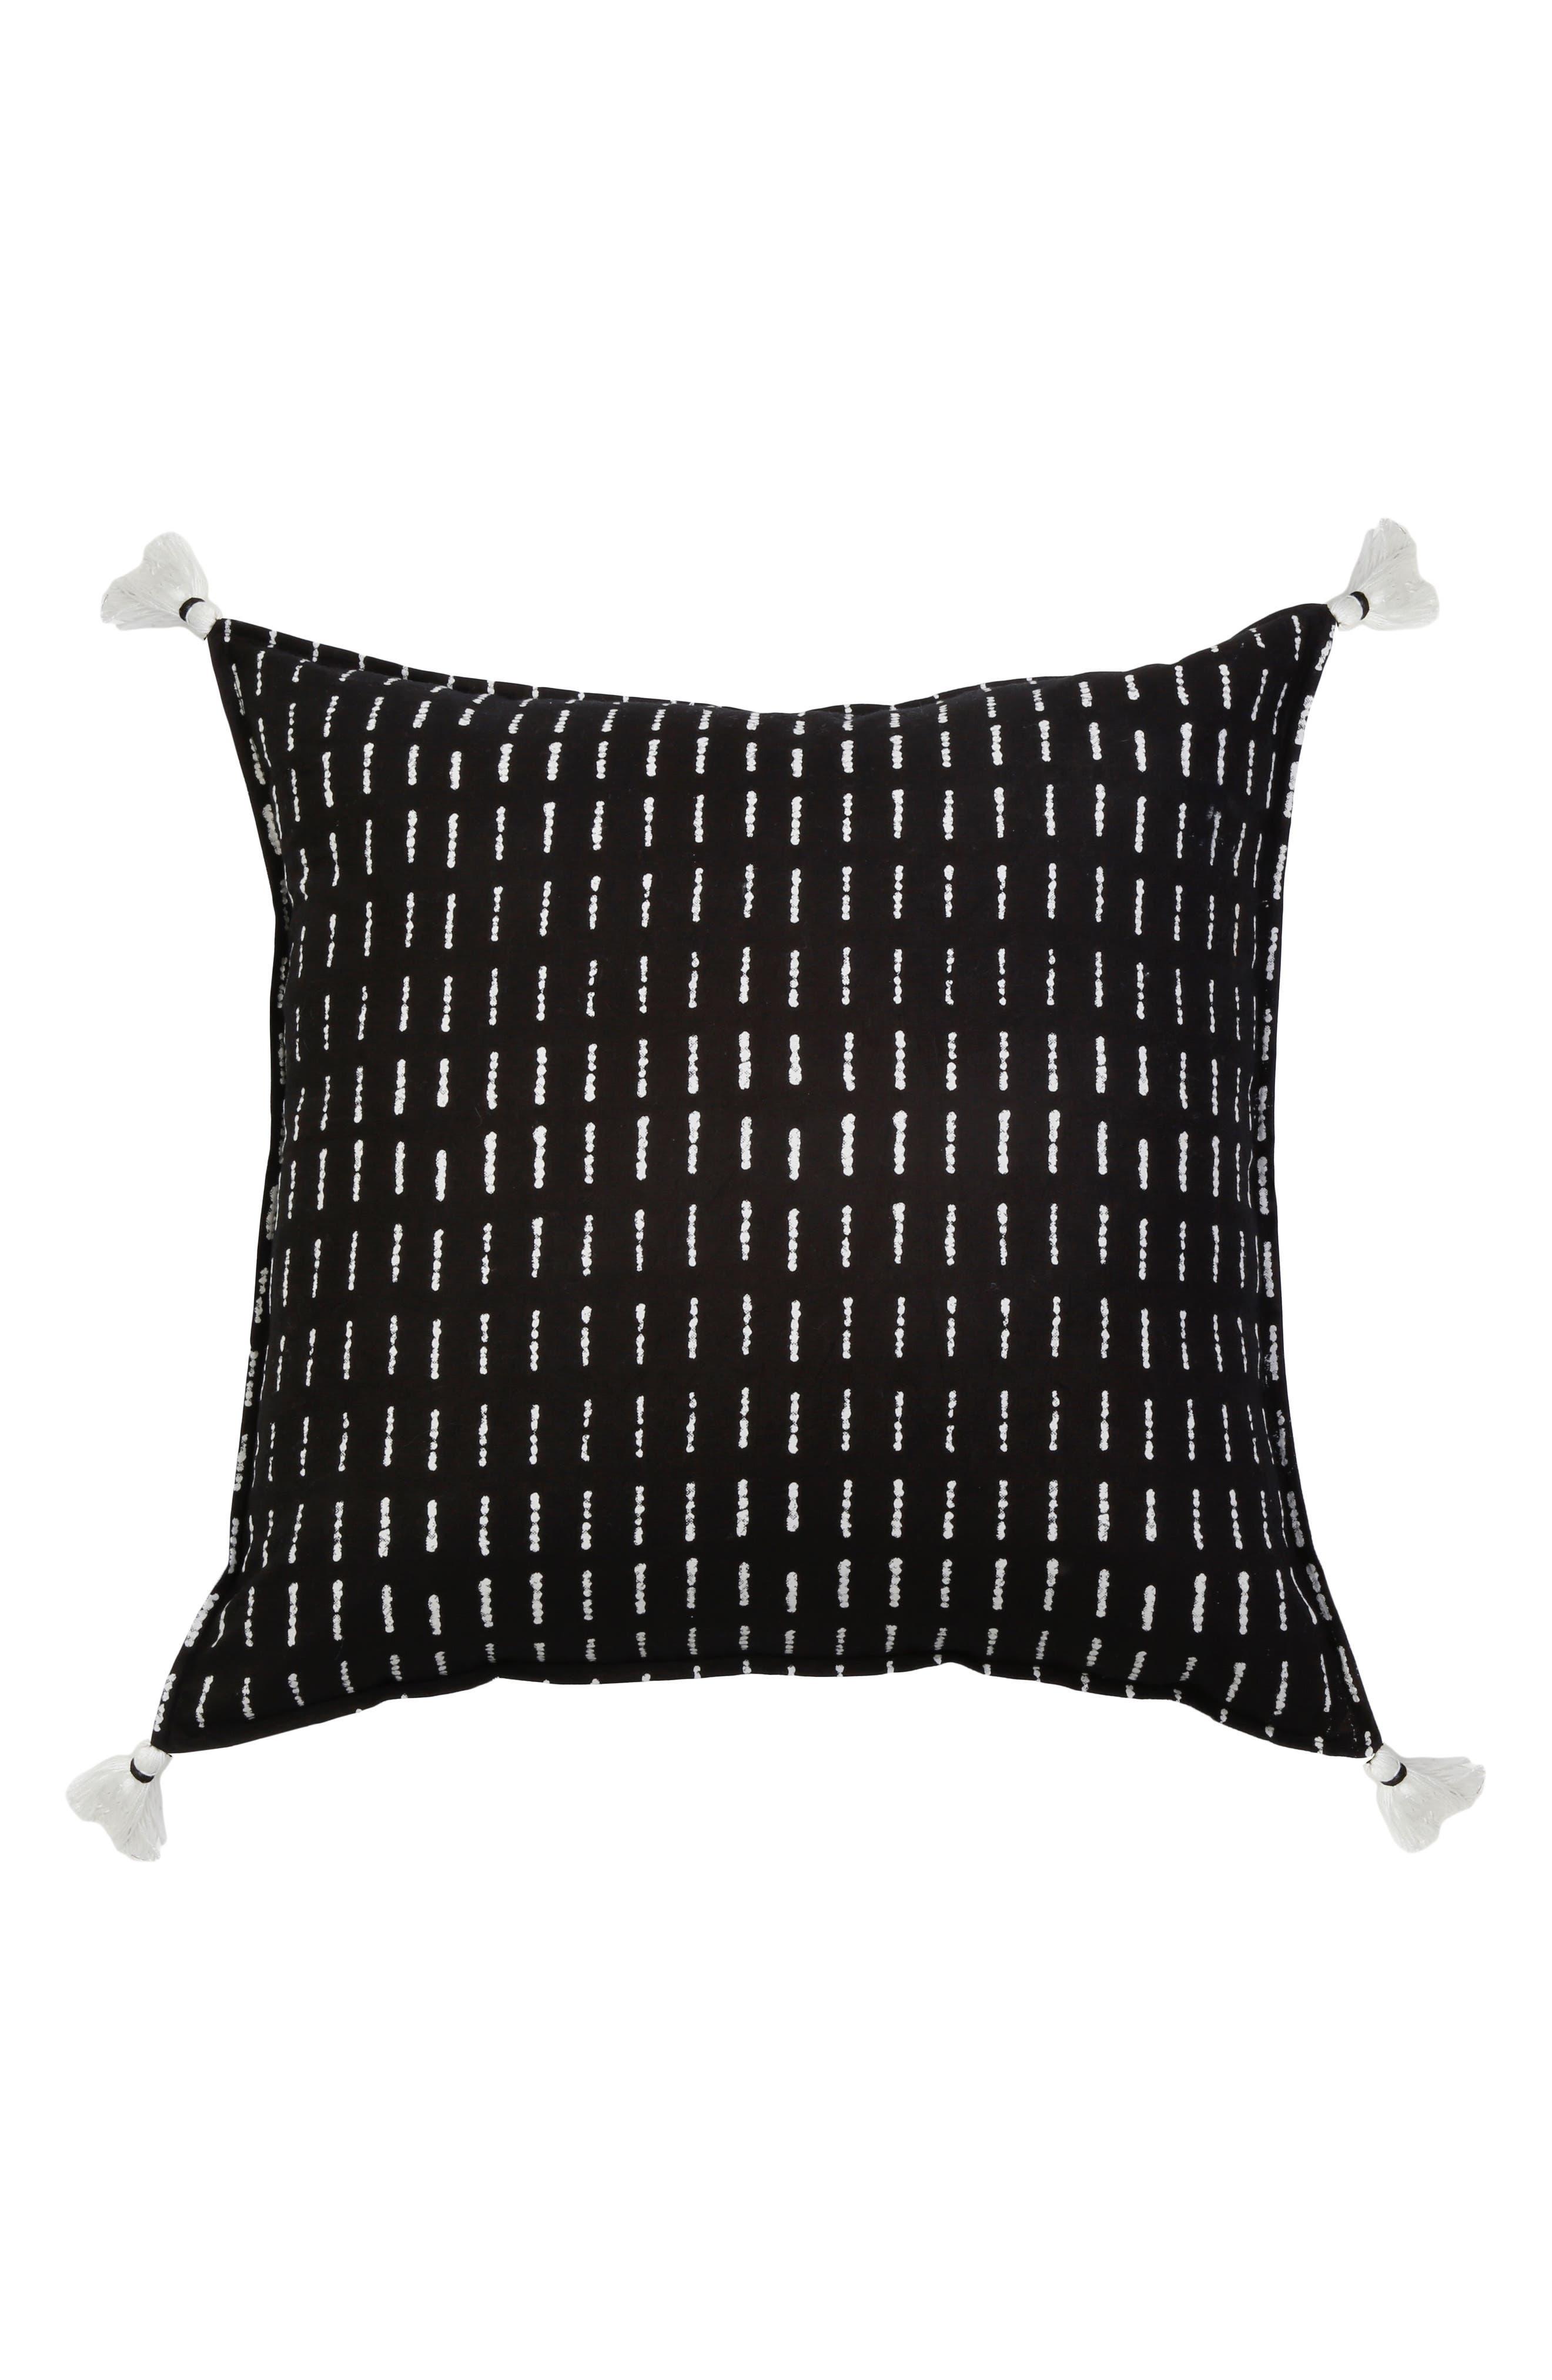 Main Image - Pom Pom at Home Dash Accent Pillow